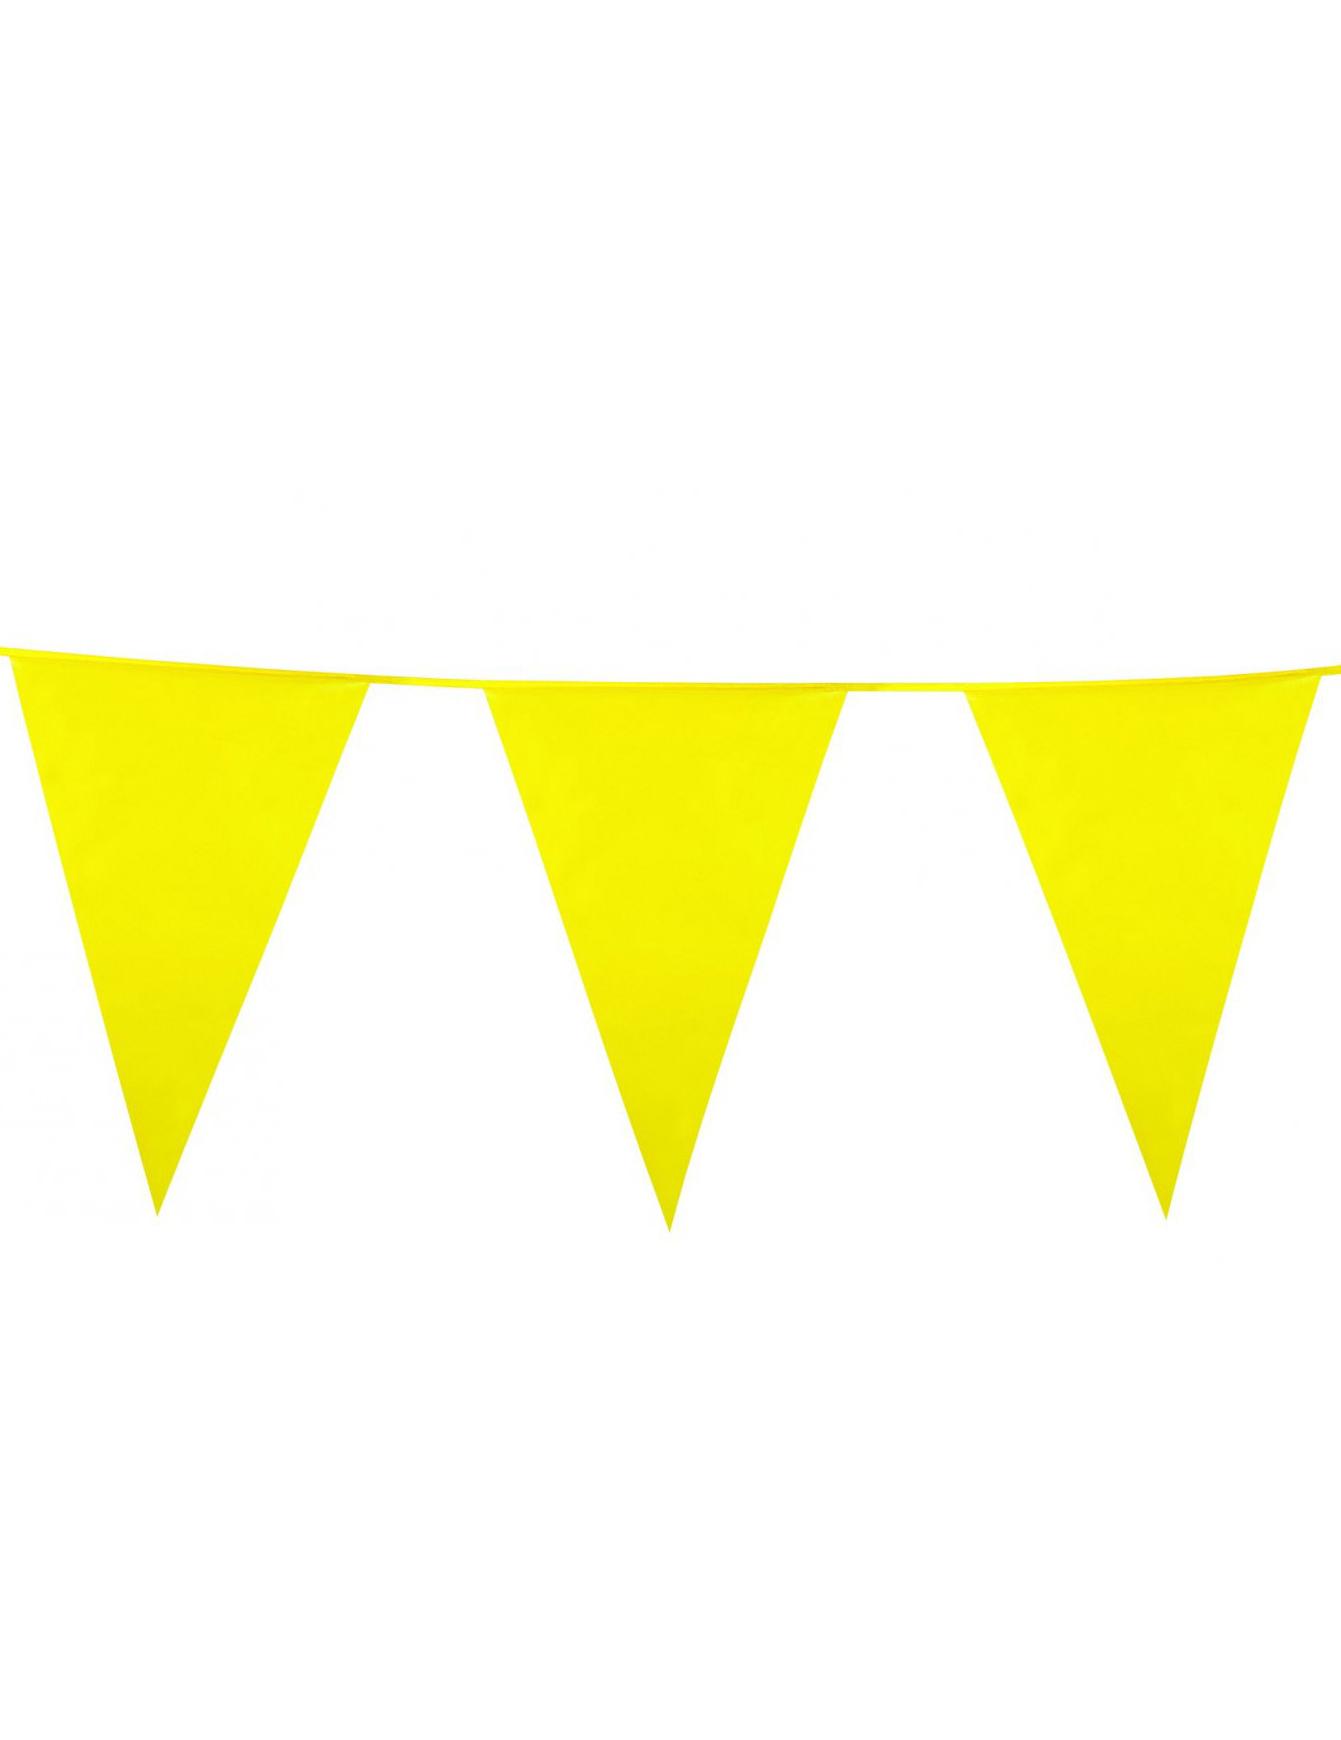 Decoration Guirlande Lumineuse Jaune : Guirlande fanions jaune deguise toi achat de decoration